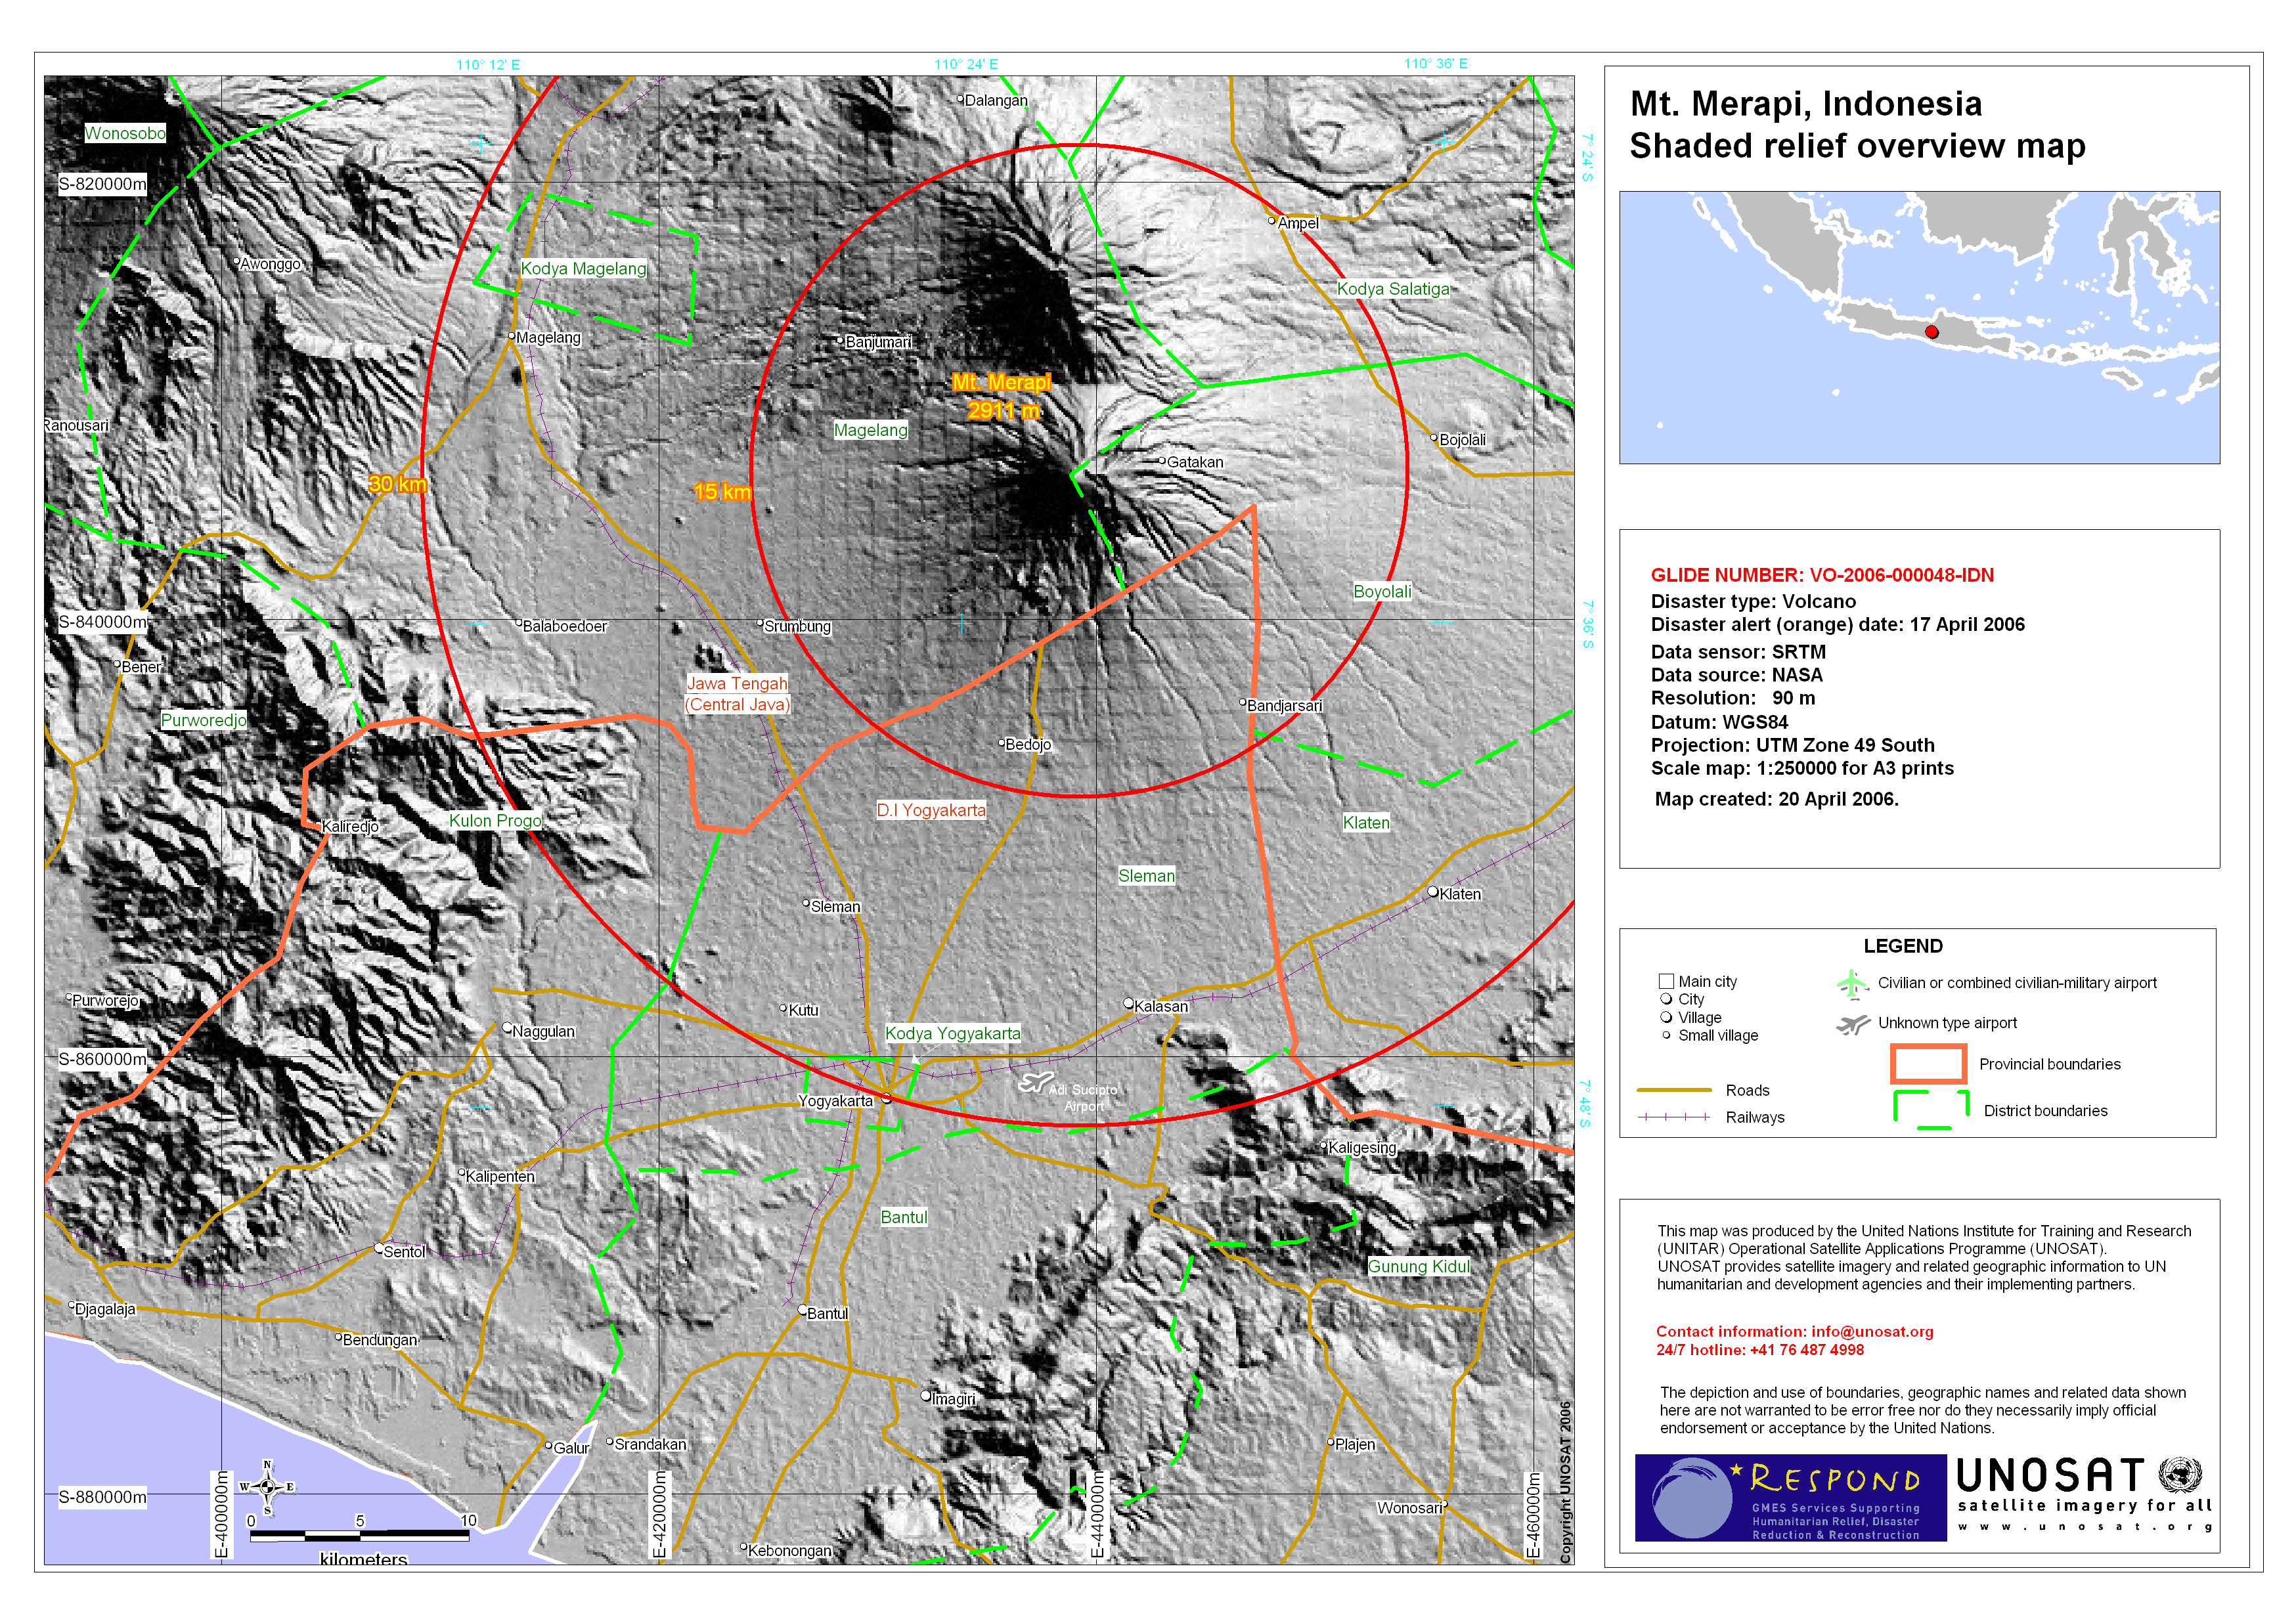 Yogyakarta and Mt. Merapi area topography overview   UNITAR